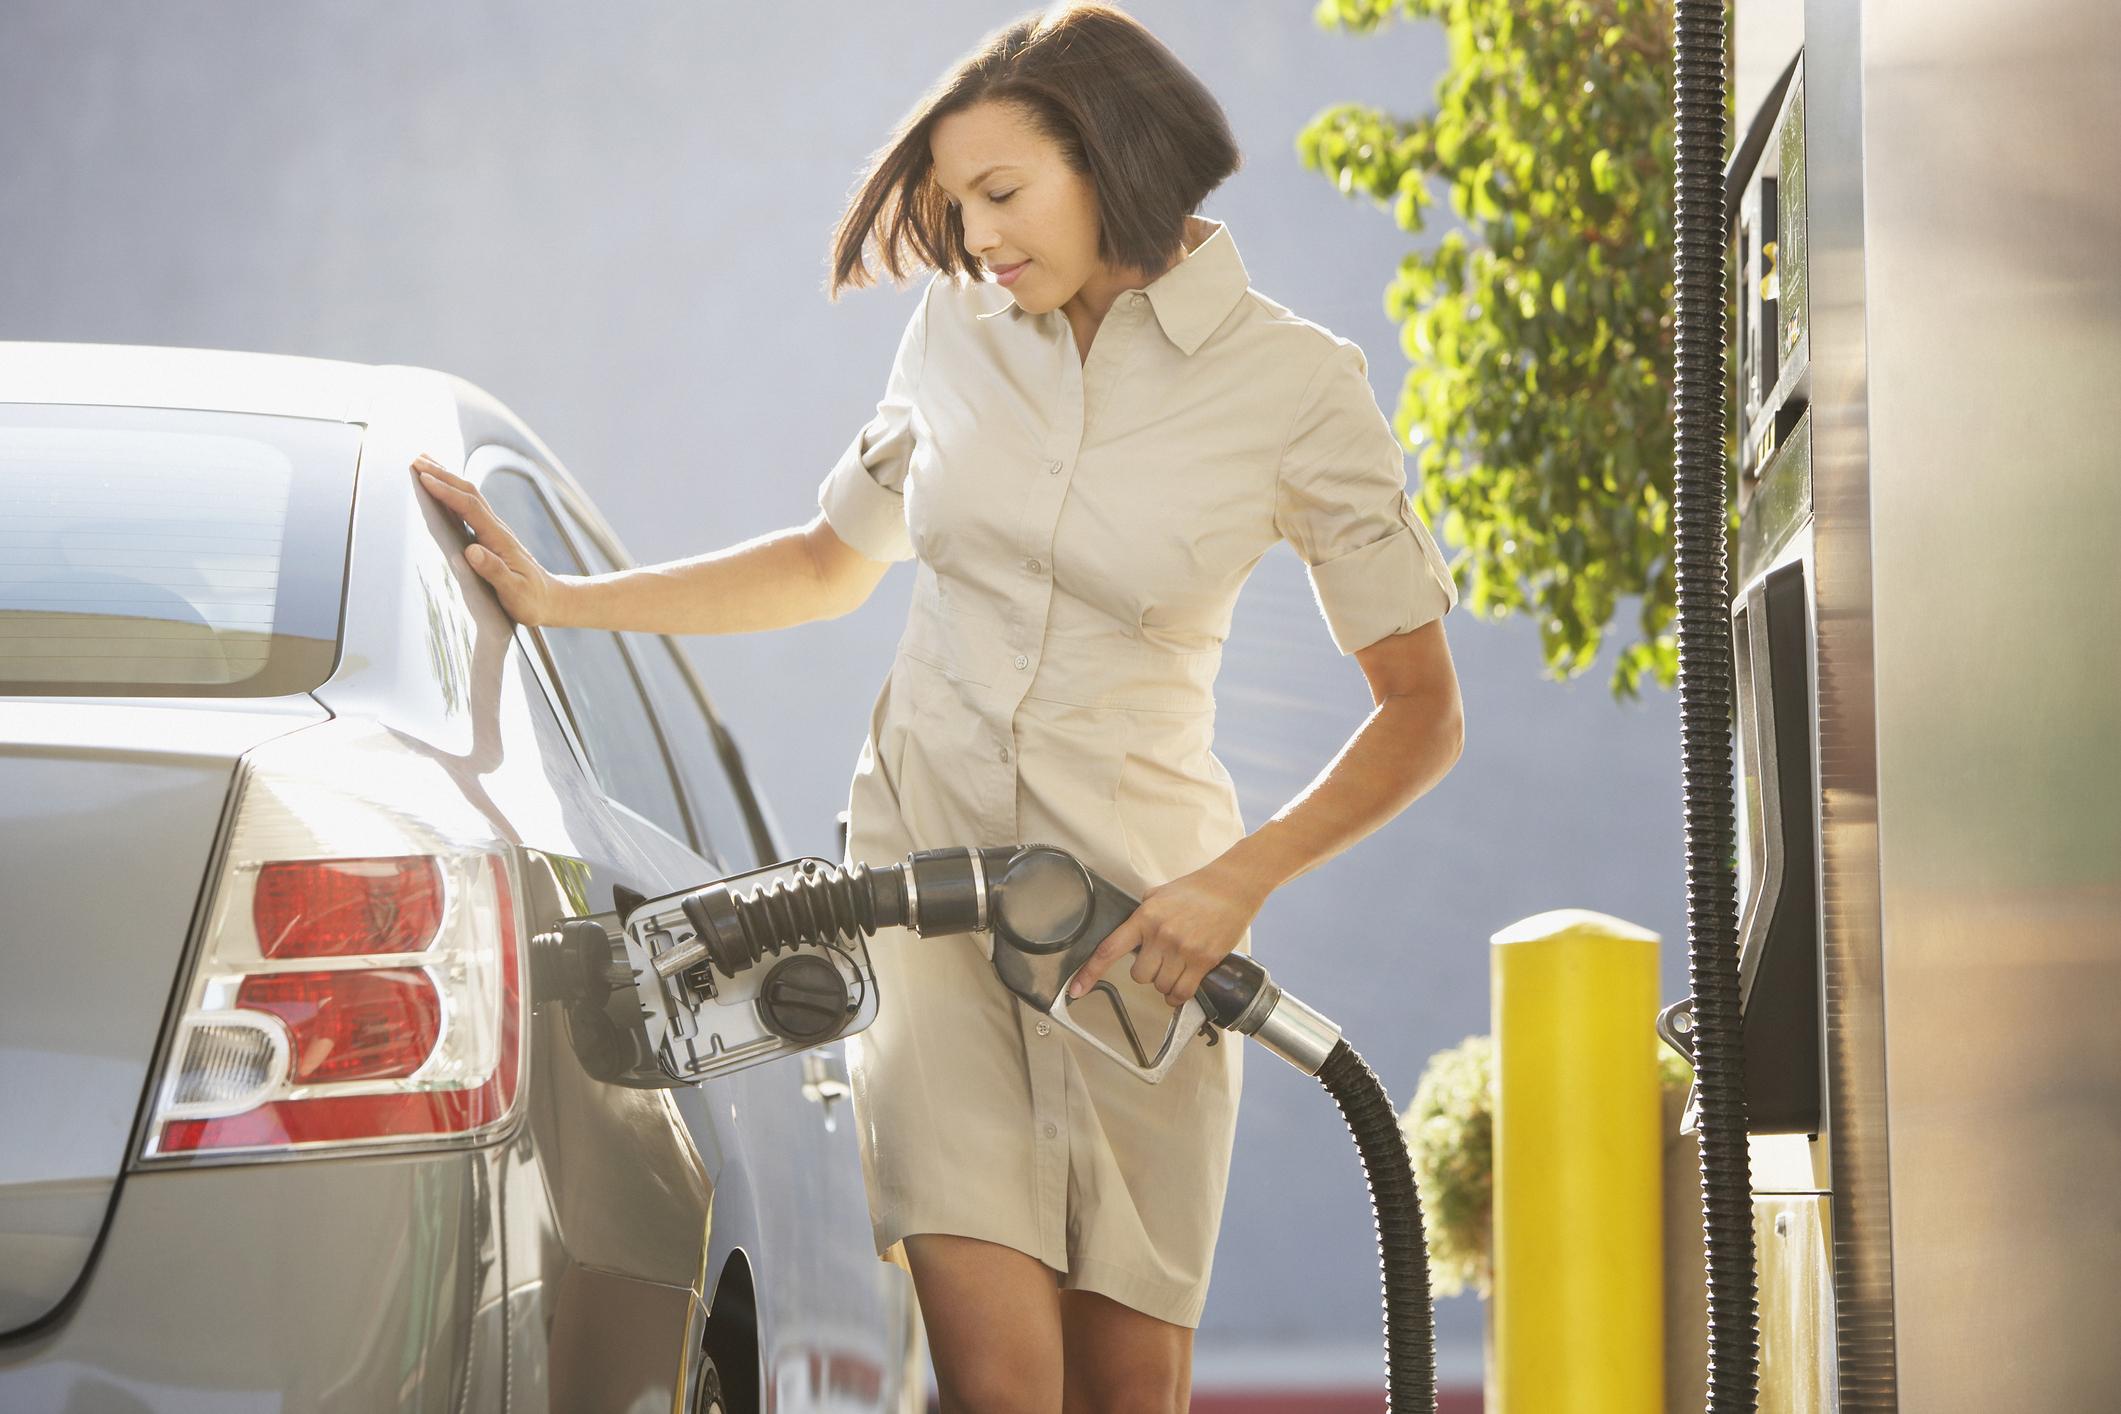 A woman pumping gas into a passenger car